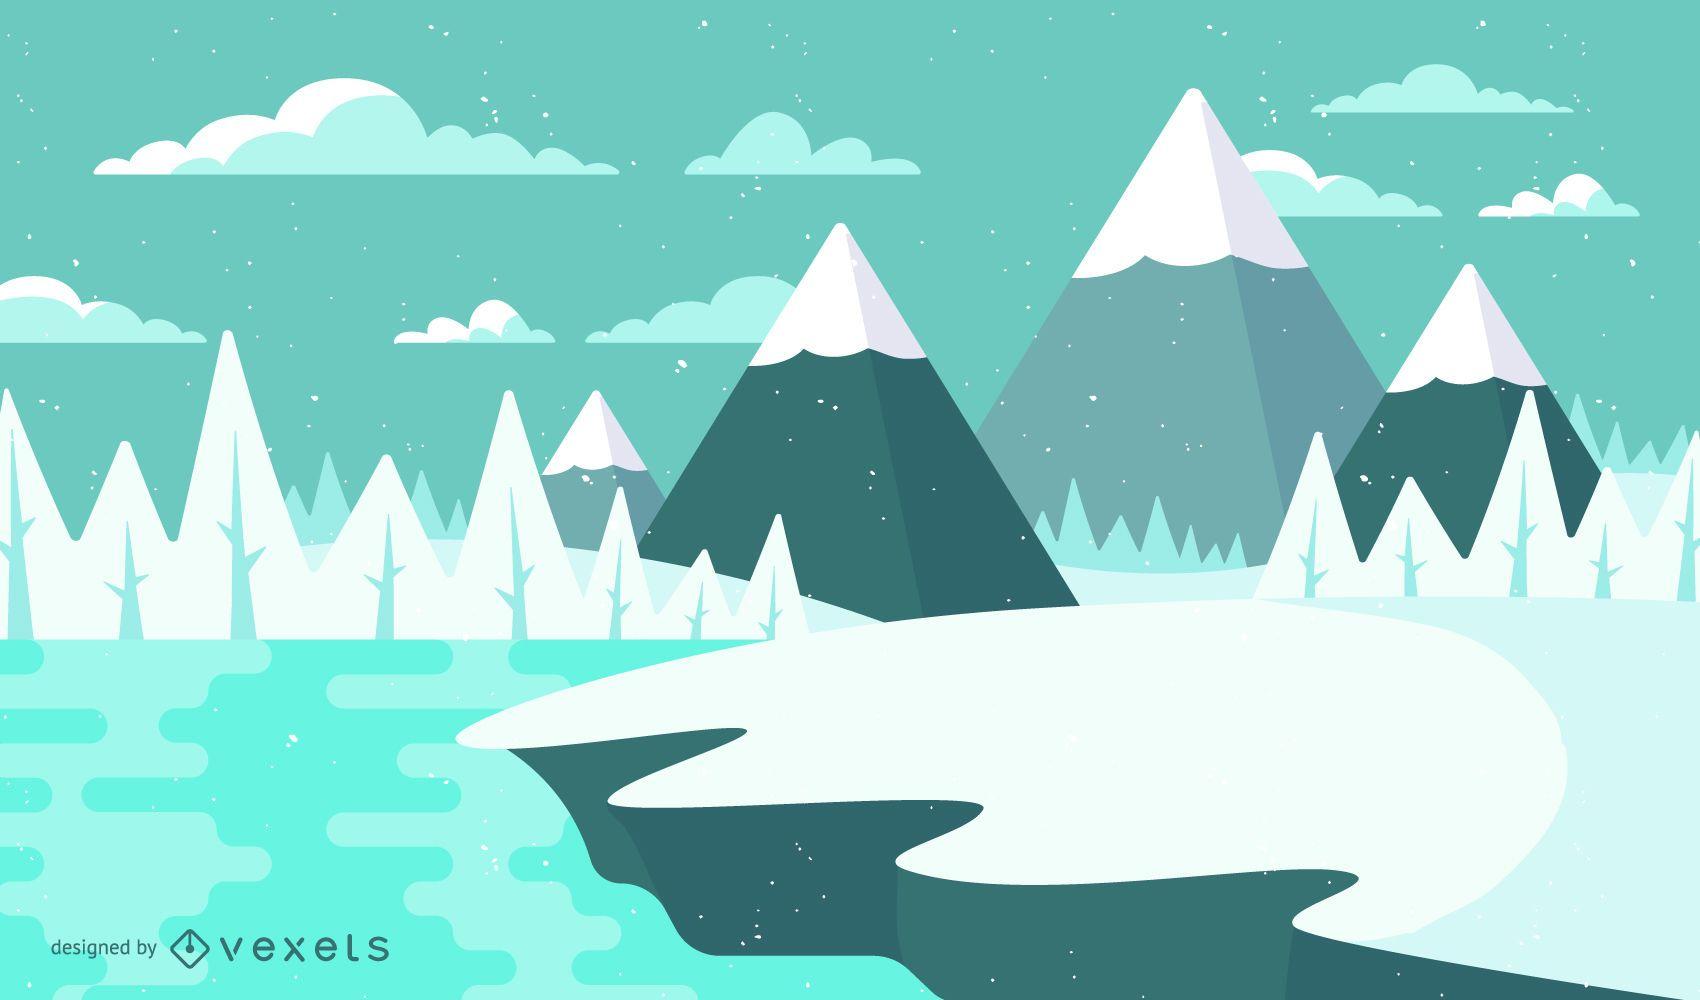 Landscape Illustration Vector Free: Winter Snow Landscape Illustration